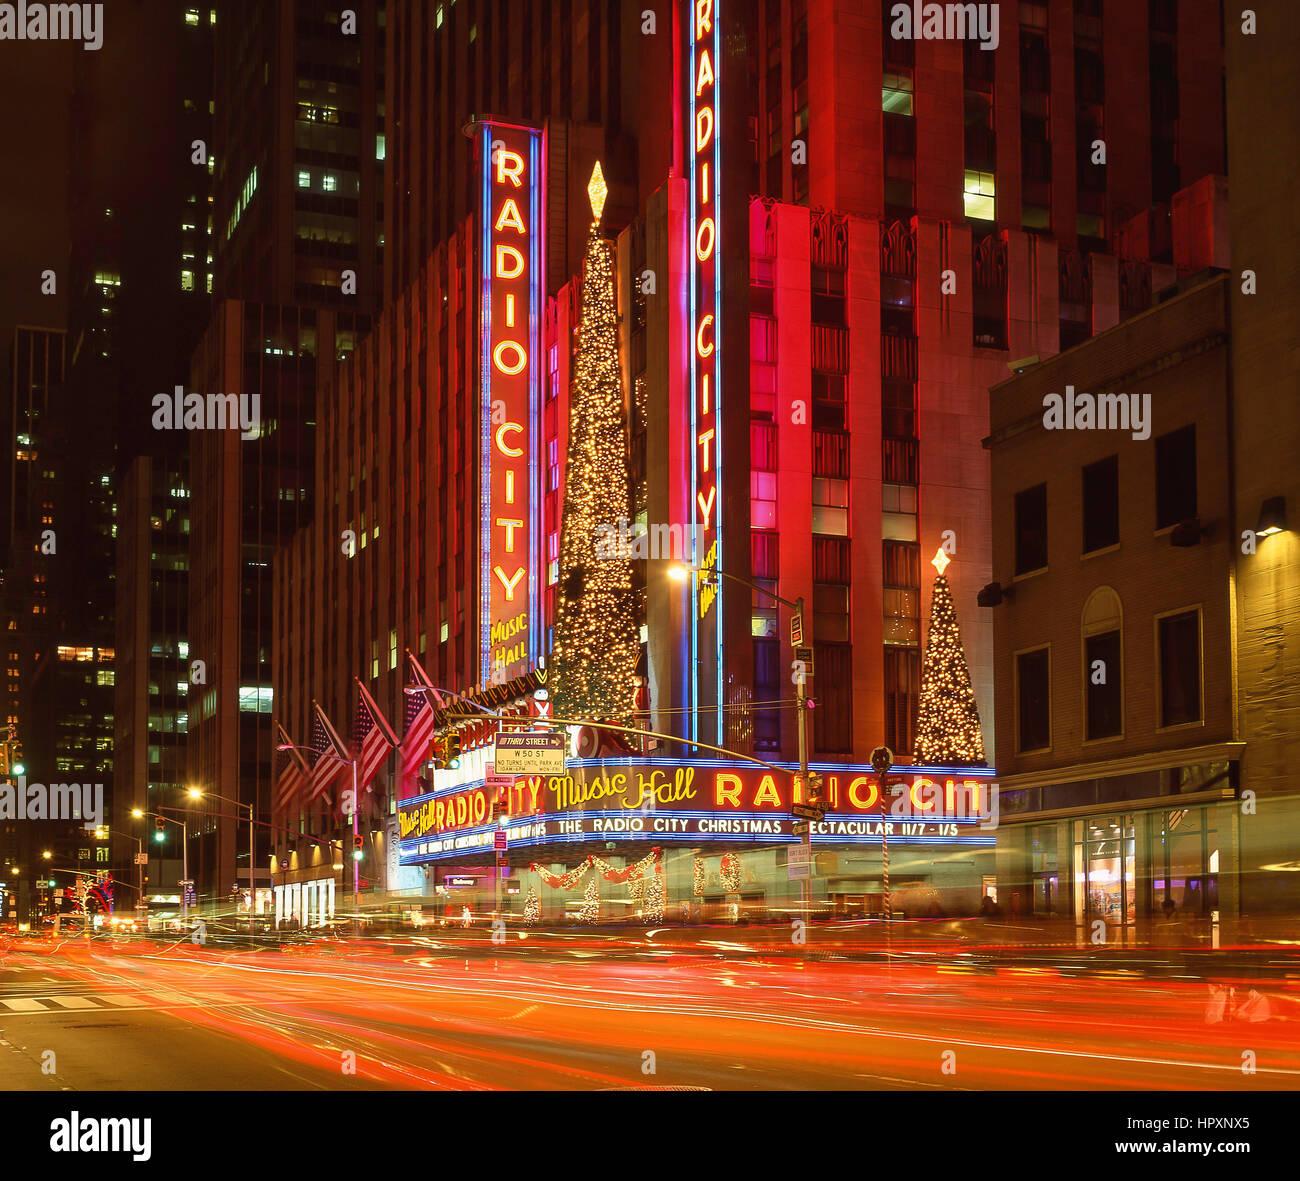 Radio City Music Hall at night, Rockefeller Center, Avenue Of The Republic, Manhattan, New York, New York State, - Stock Image